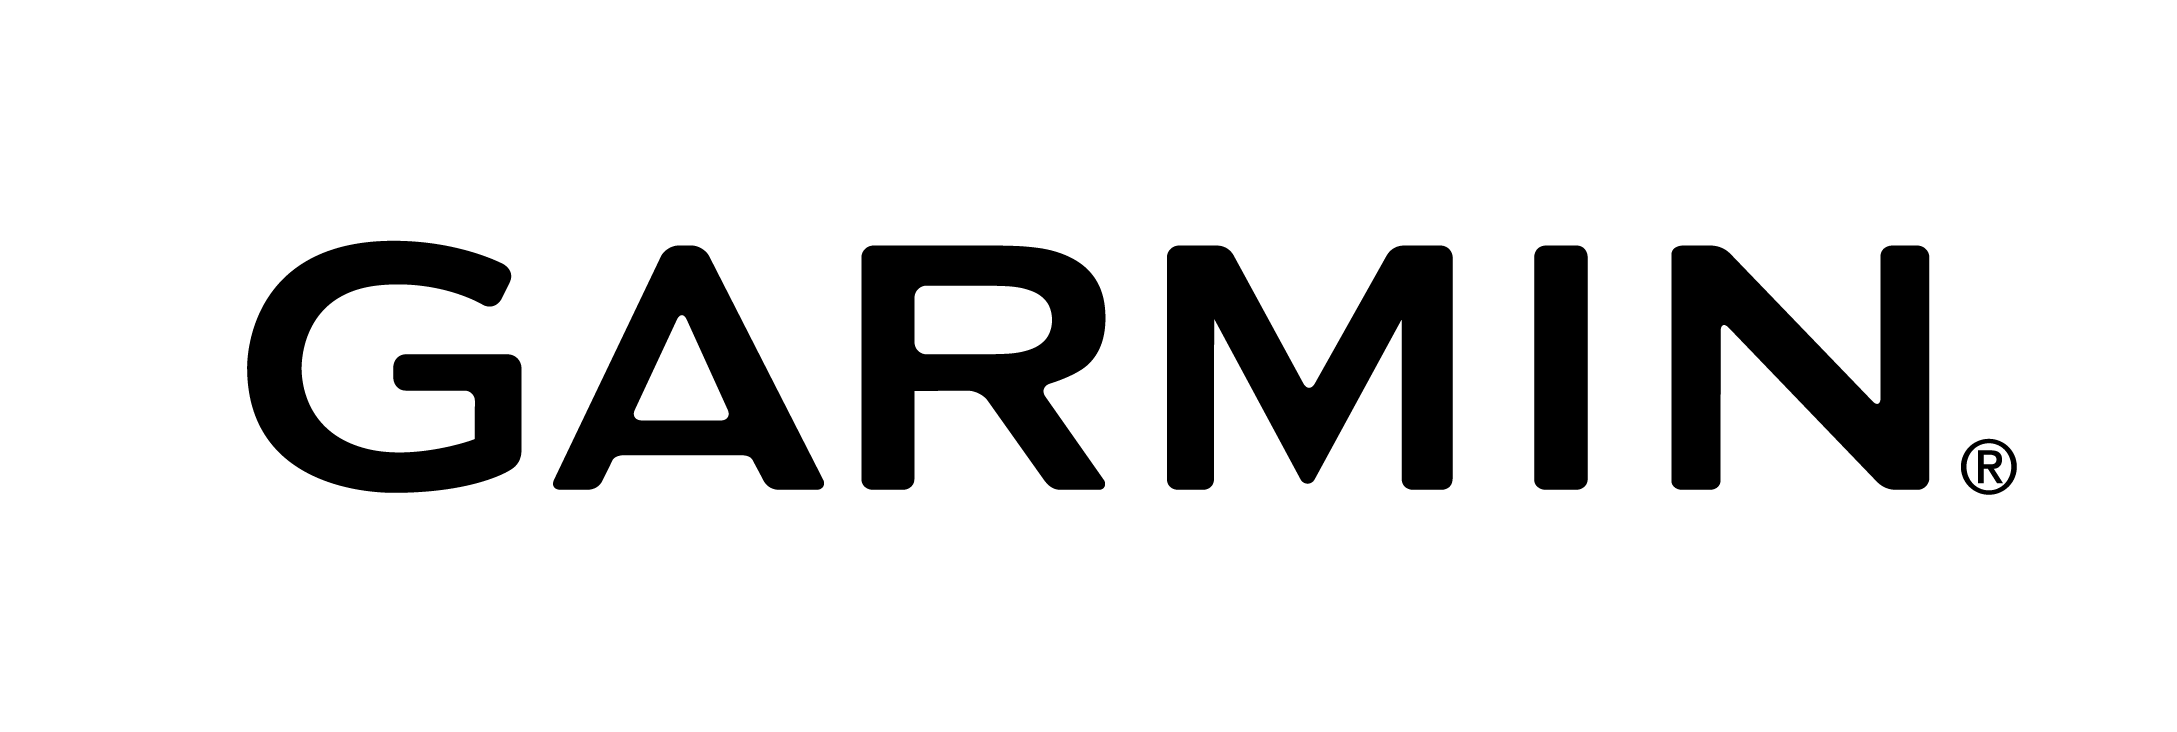 Garmin Sounder Night